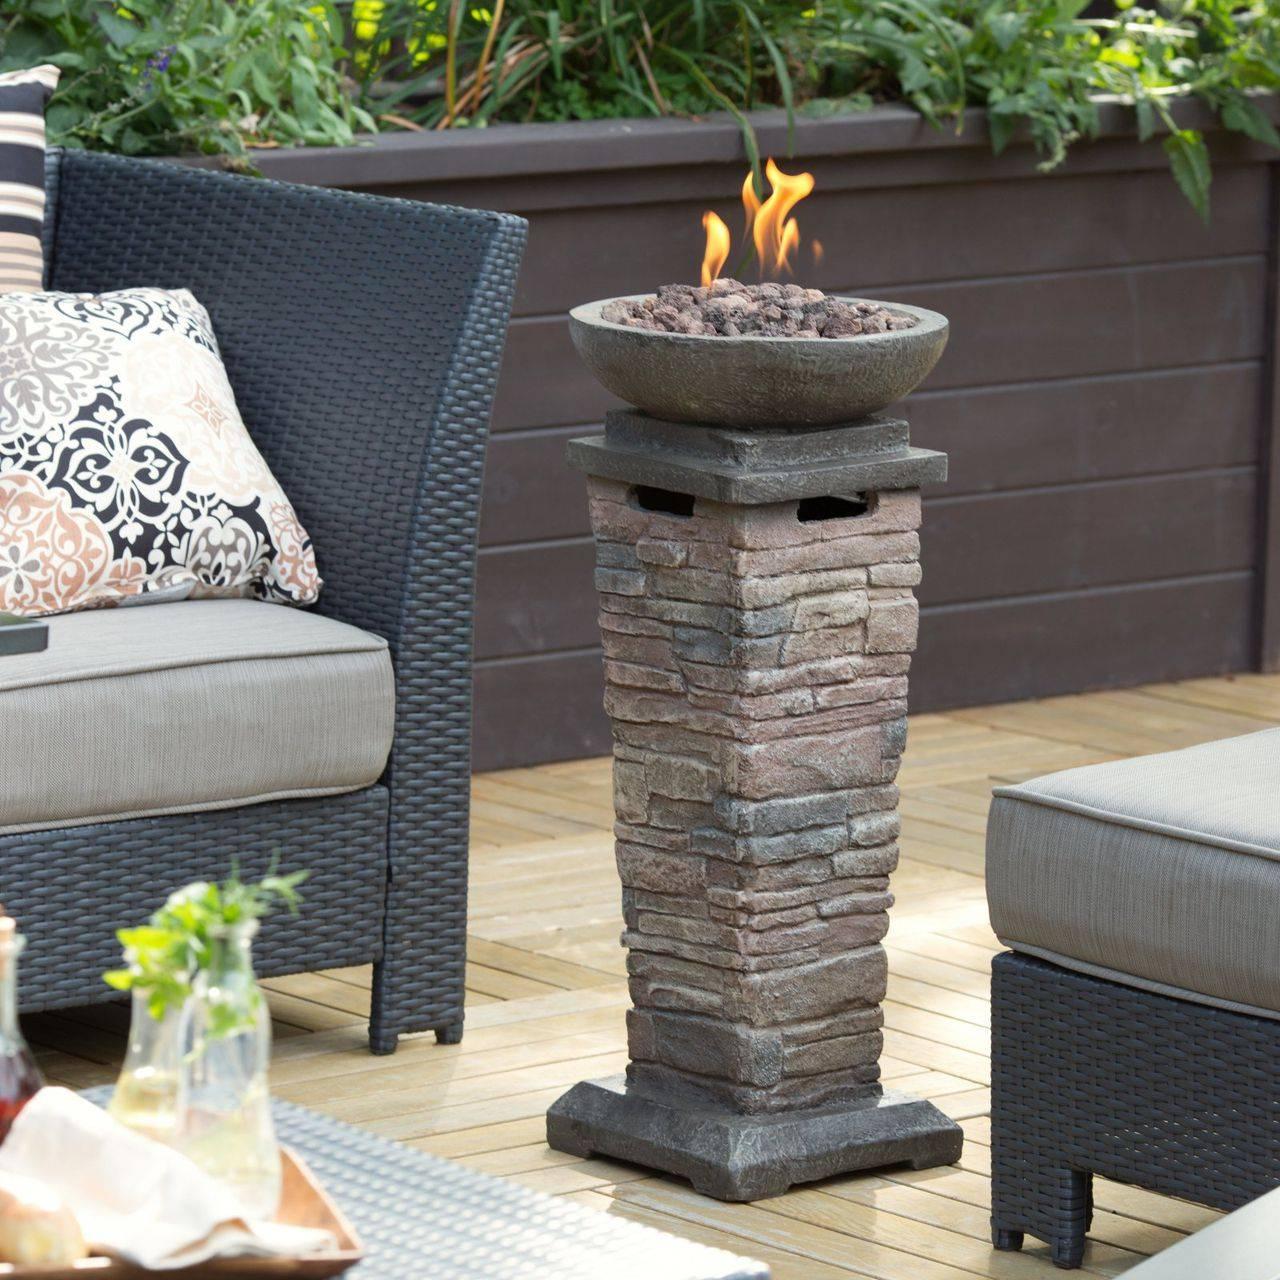 Small Space Tall Freestanding Fire Column Outdoor Fire Feature